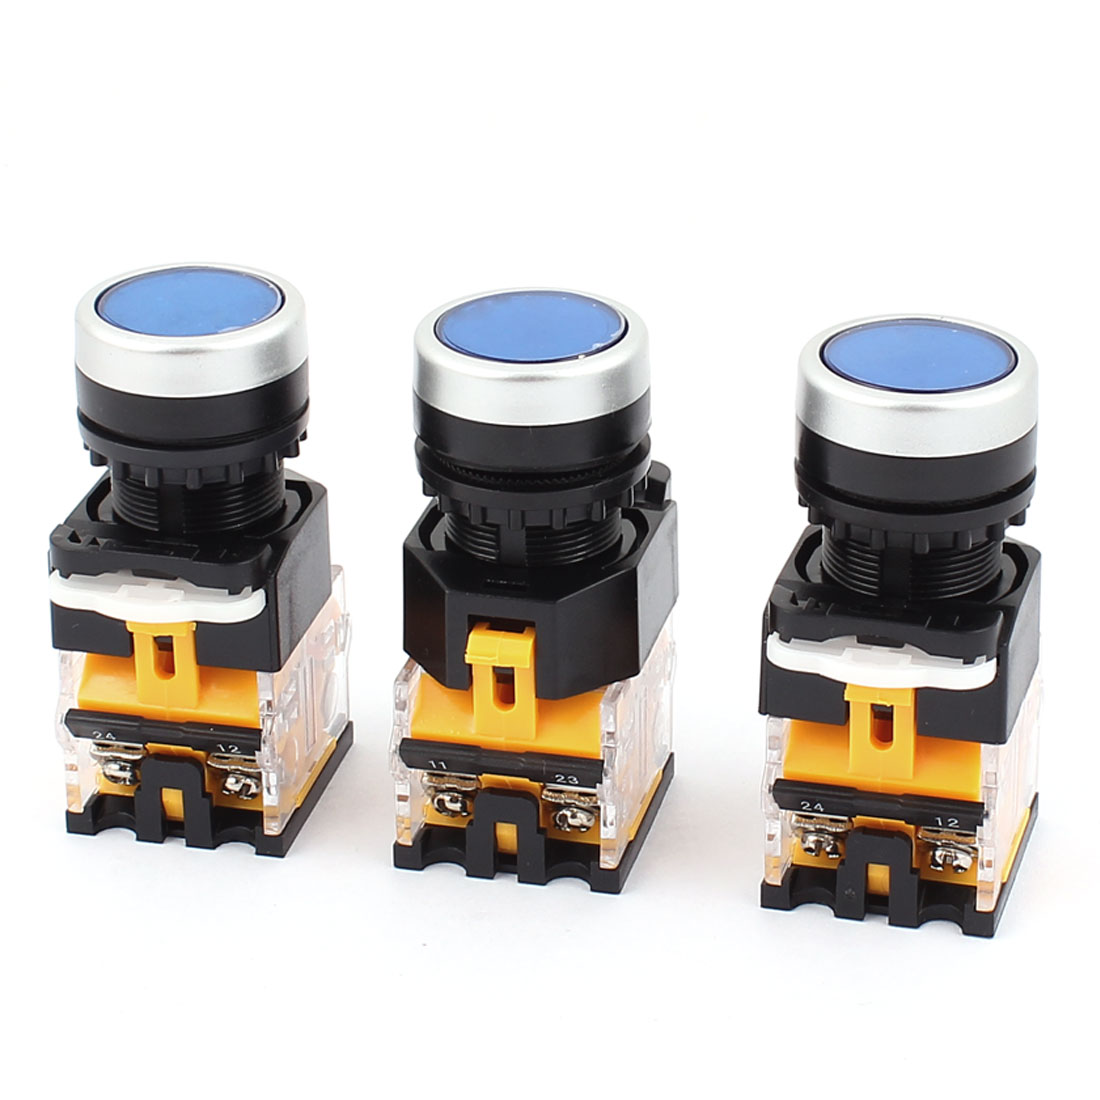 AC 660V 10A NO NC 4-Pin Momentary Blue Push Button Switch 3PCS